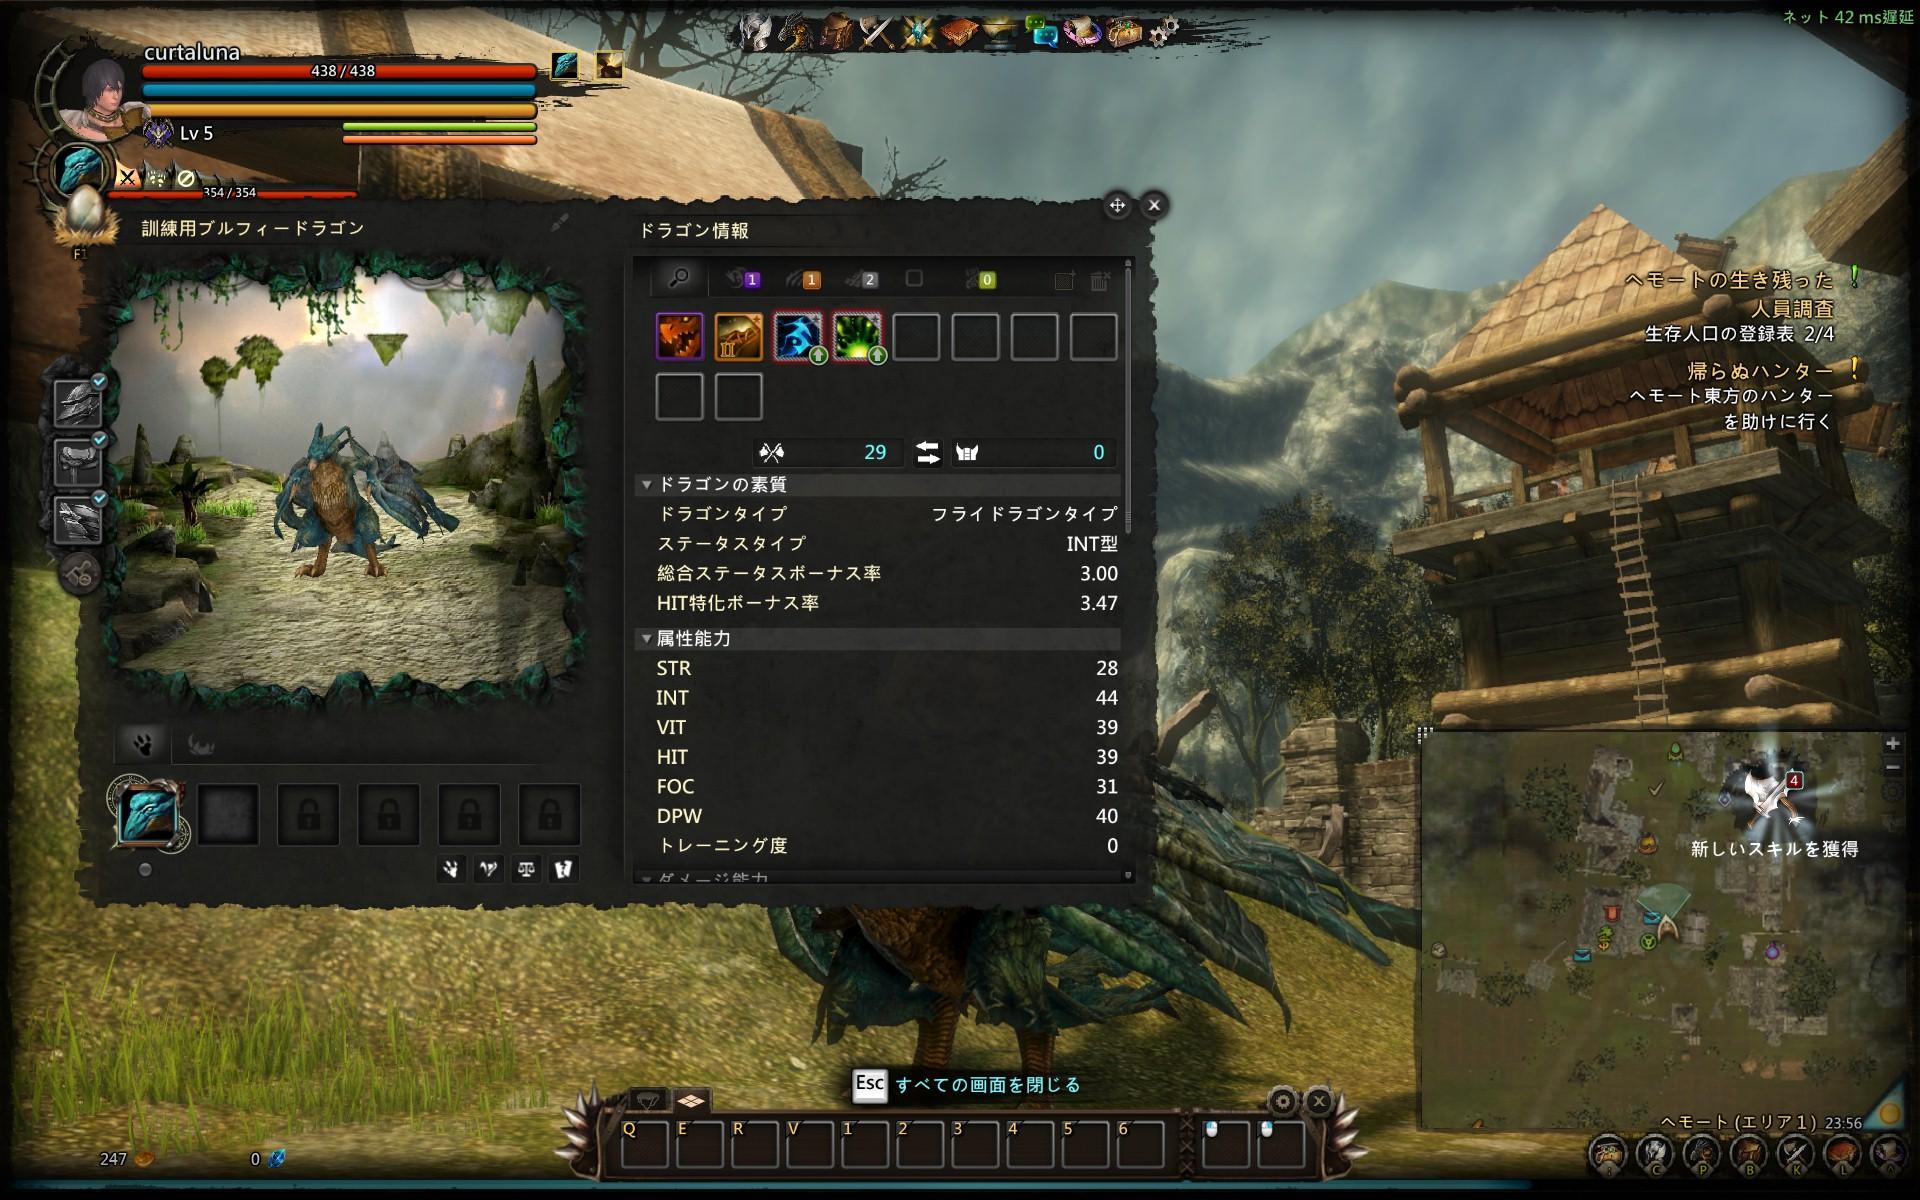 DragonsProphet_20170209_235651.jpg